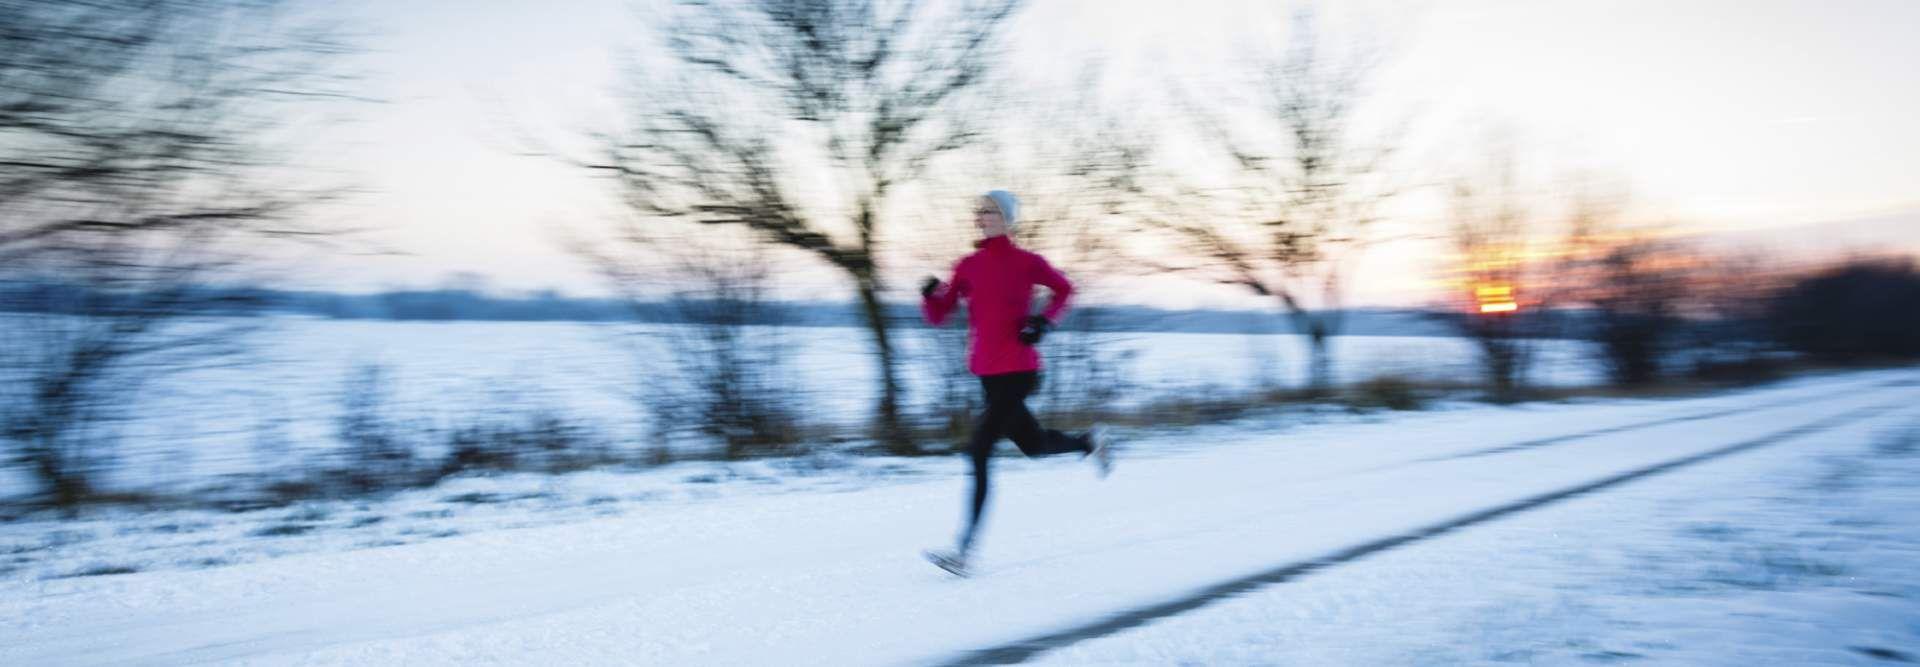 Winter run 2 winter running fleet feet running